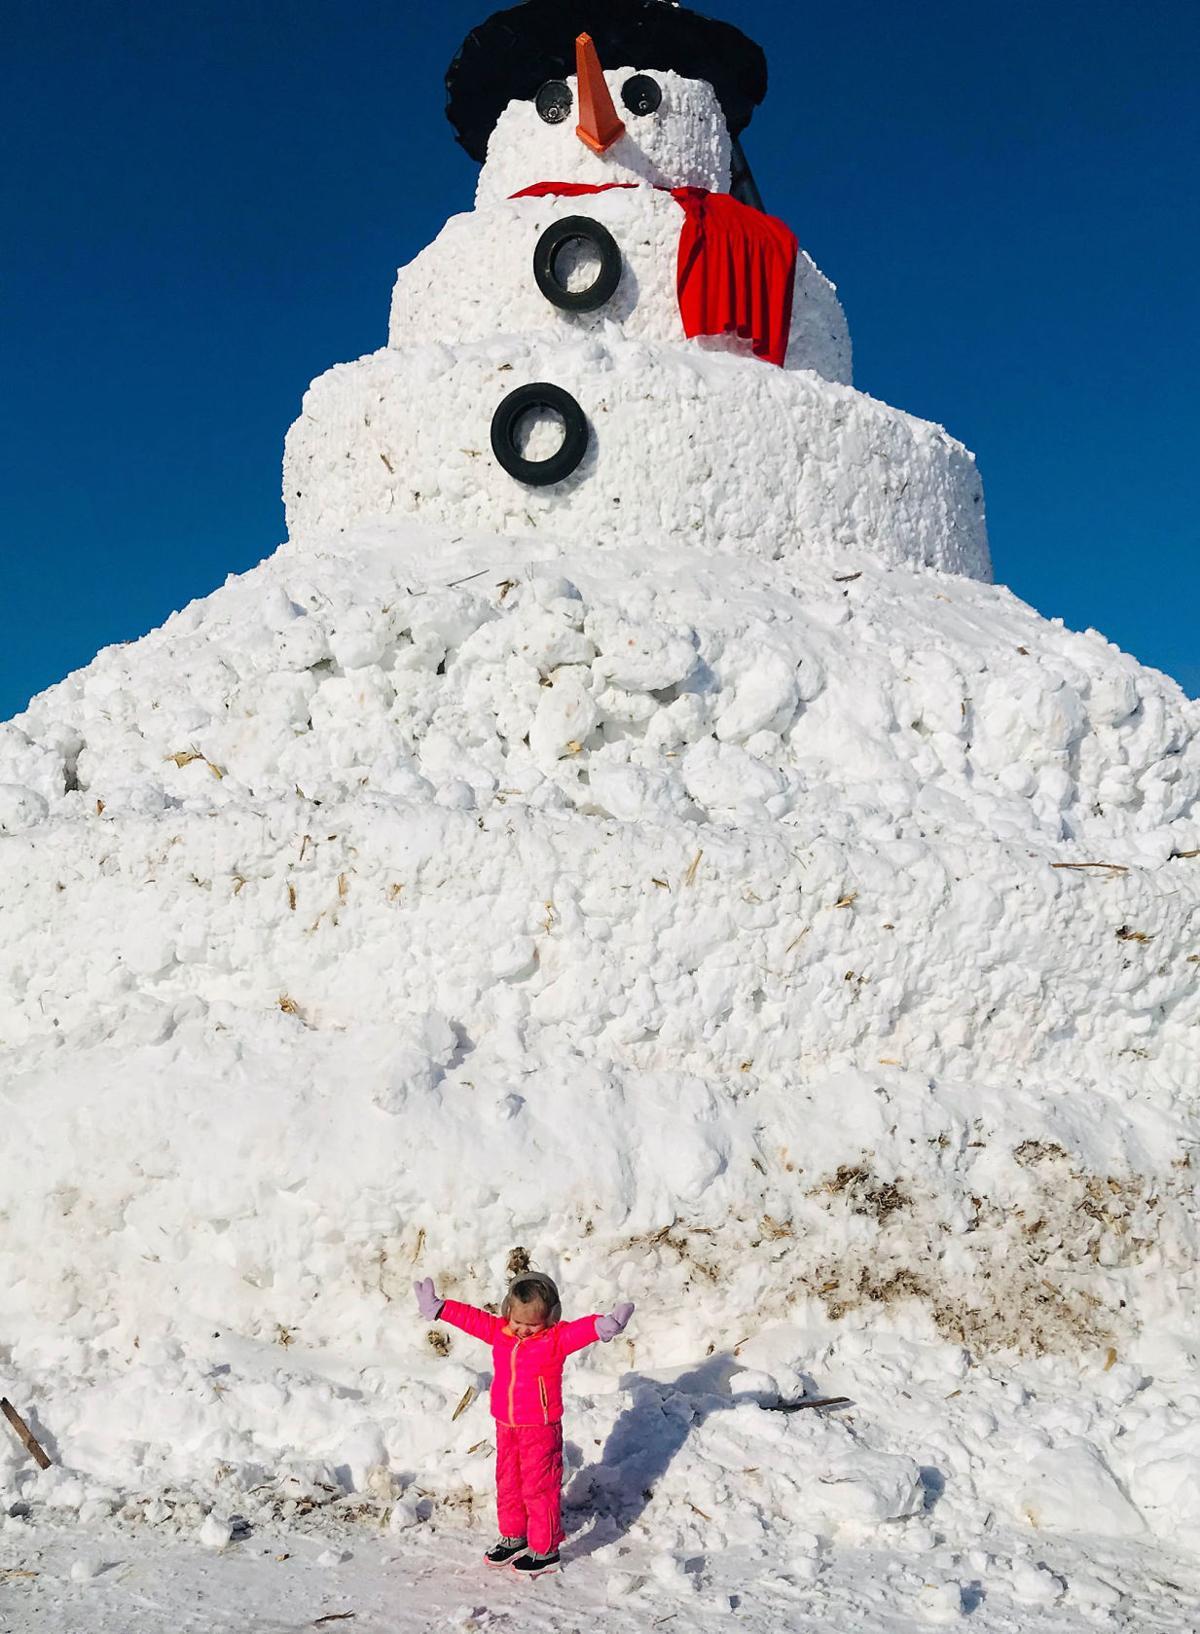 031319_con_snowman